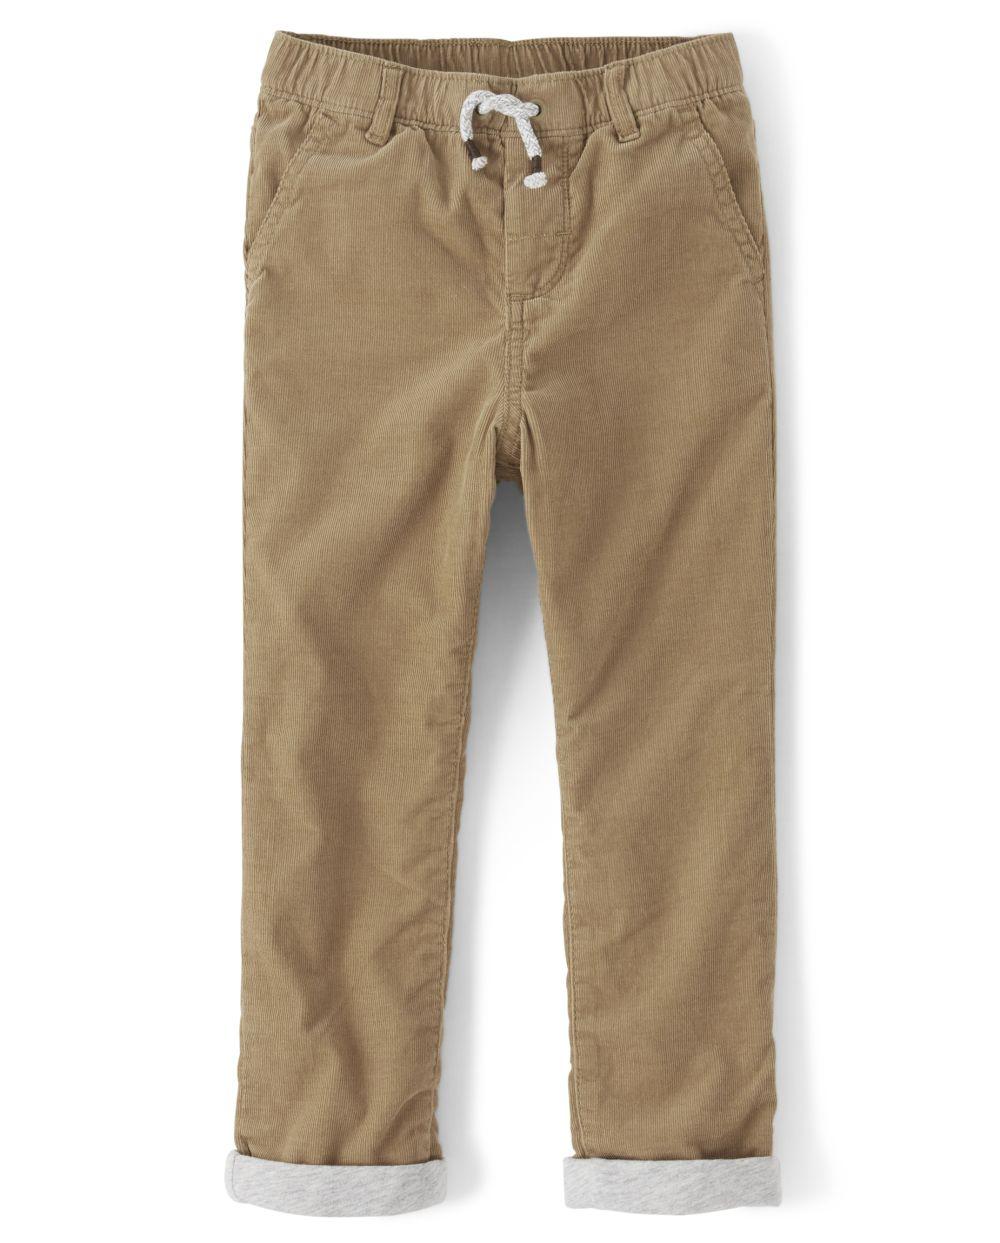 Boys Corduroy Pants